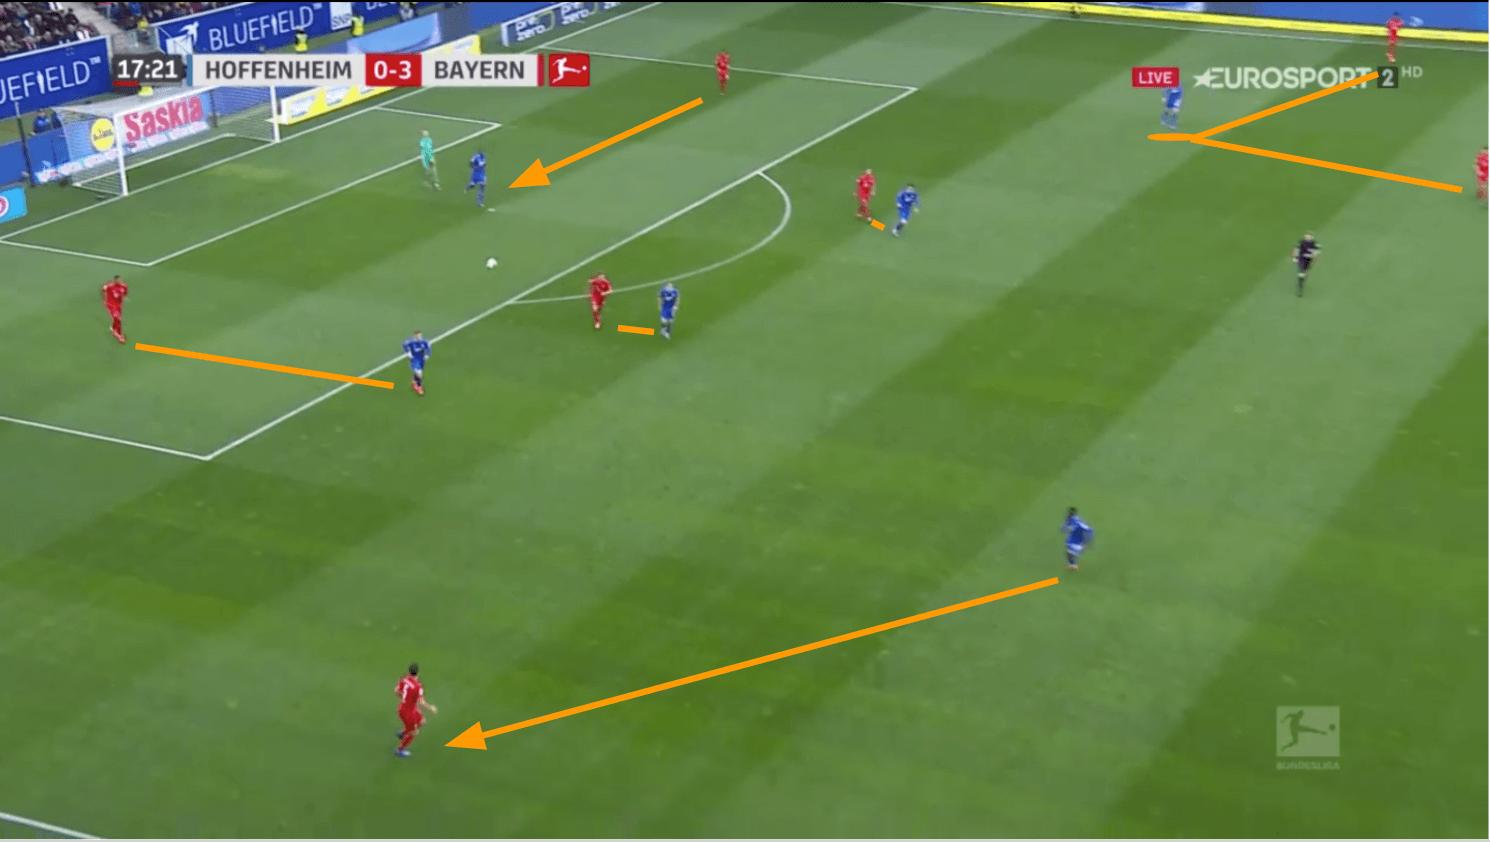 Bundesliga 2019/20: Bayer Leverkusen vs Bayern Munich - tactical analysis tactics